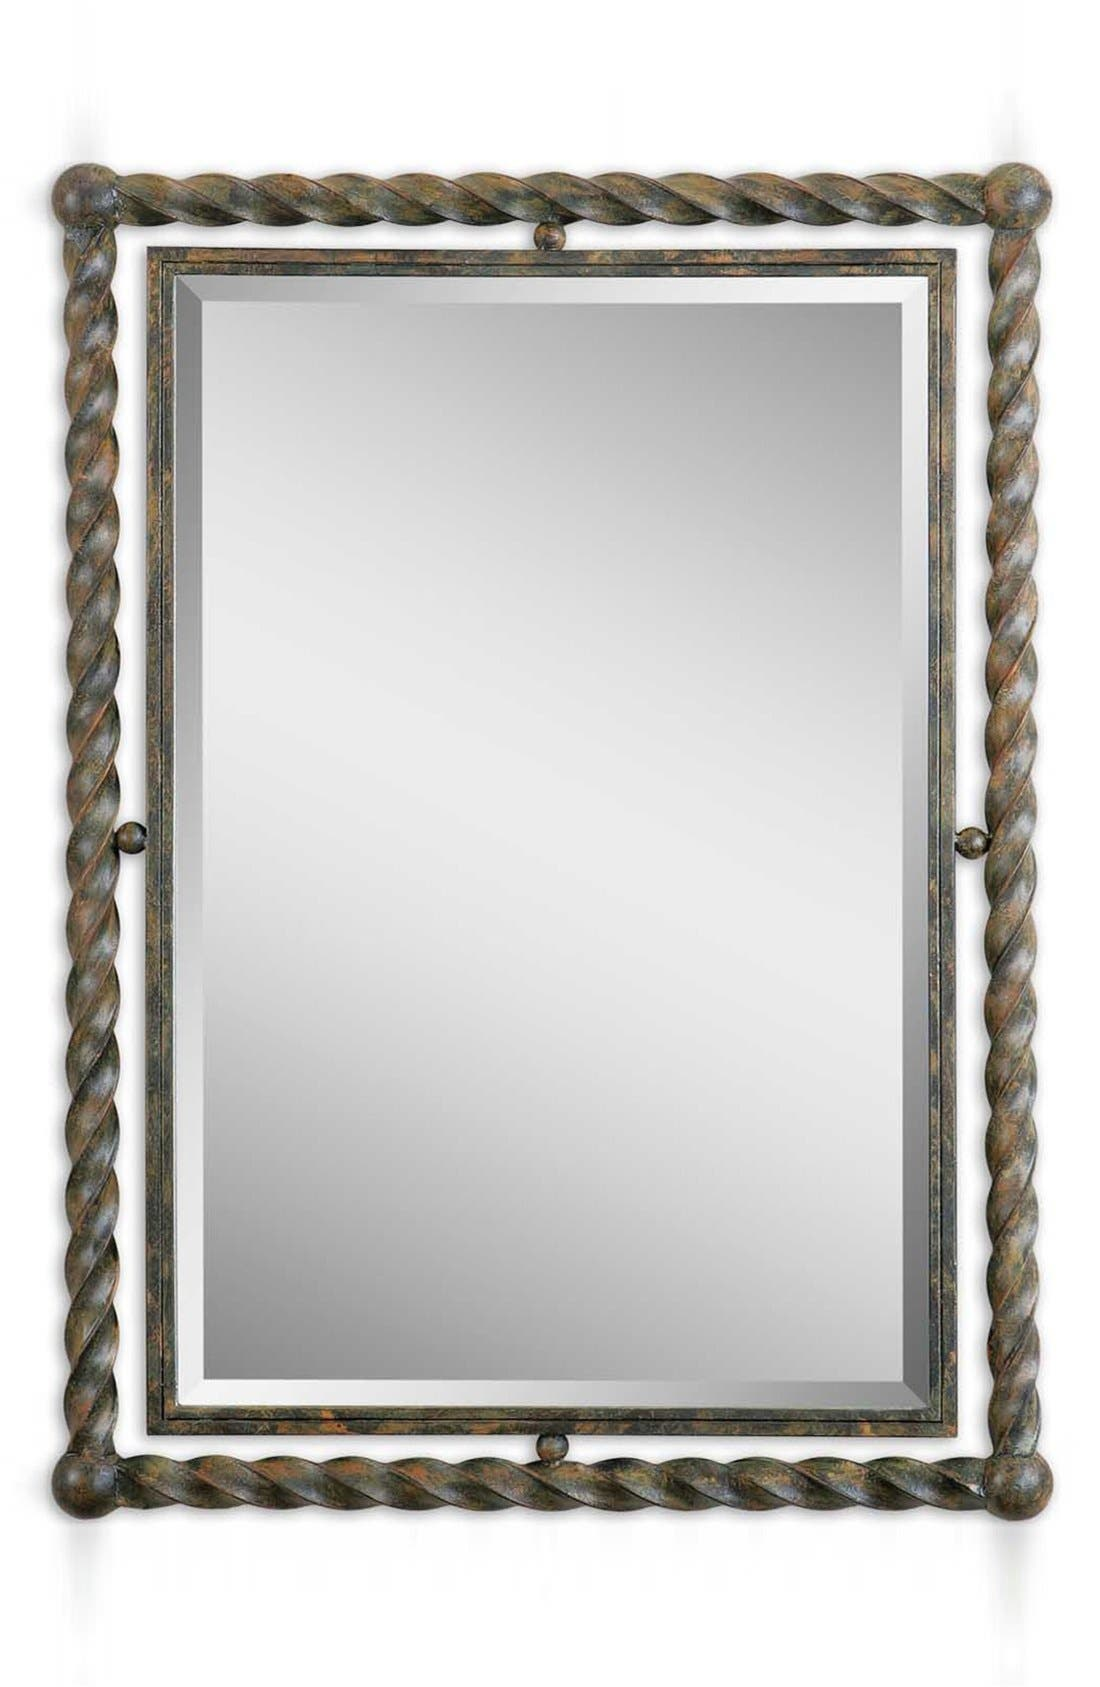 'Garrick' Wrought Iron Mirror,                             Main thumbnail 1, color,                             200